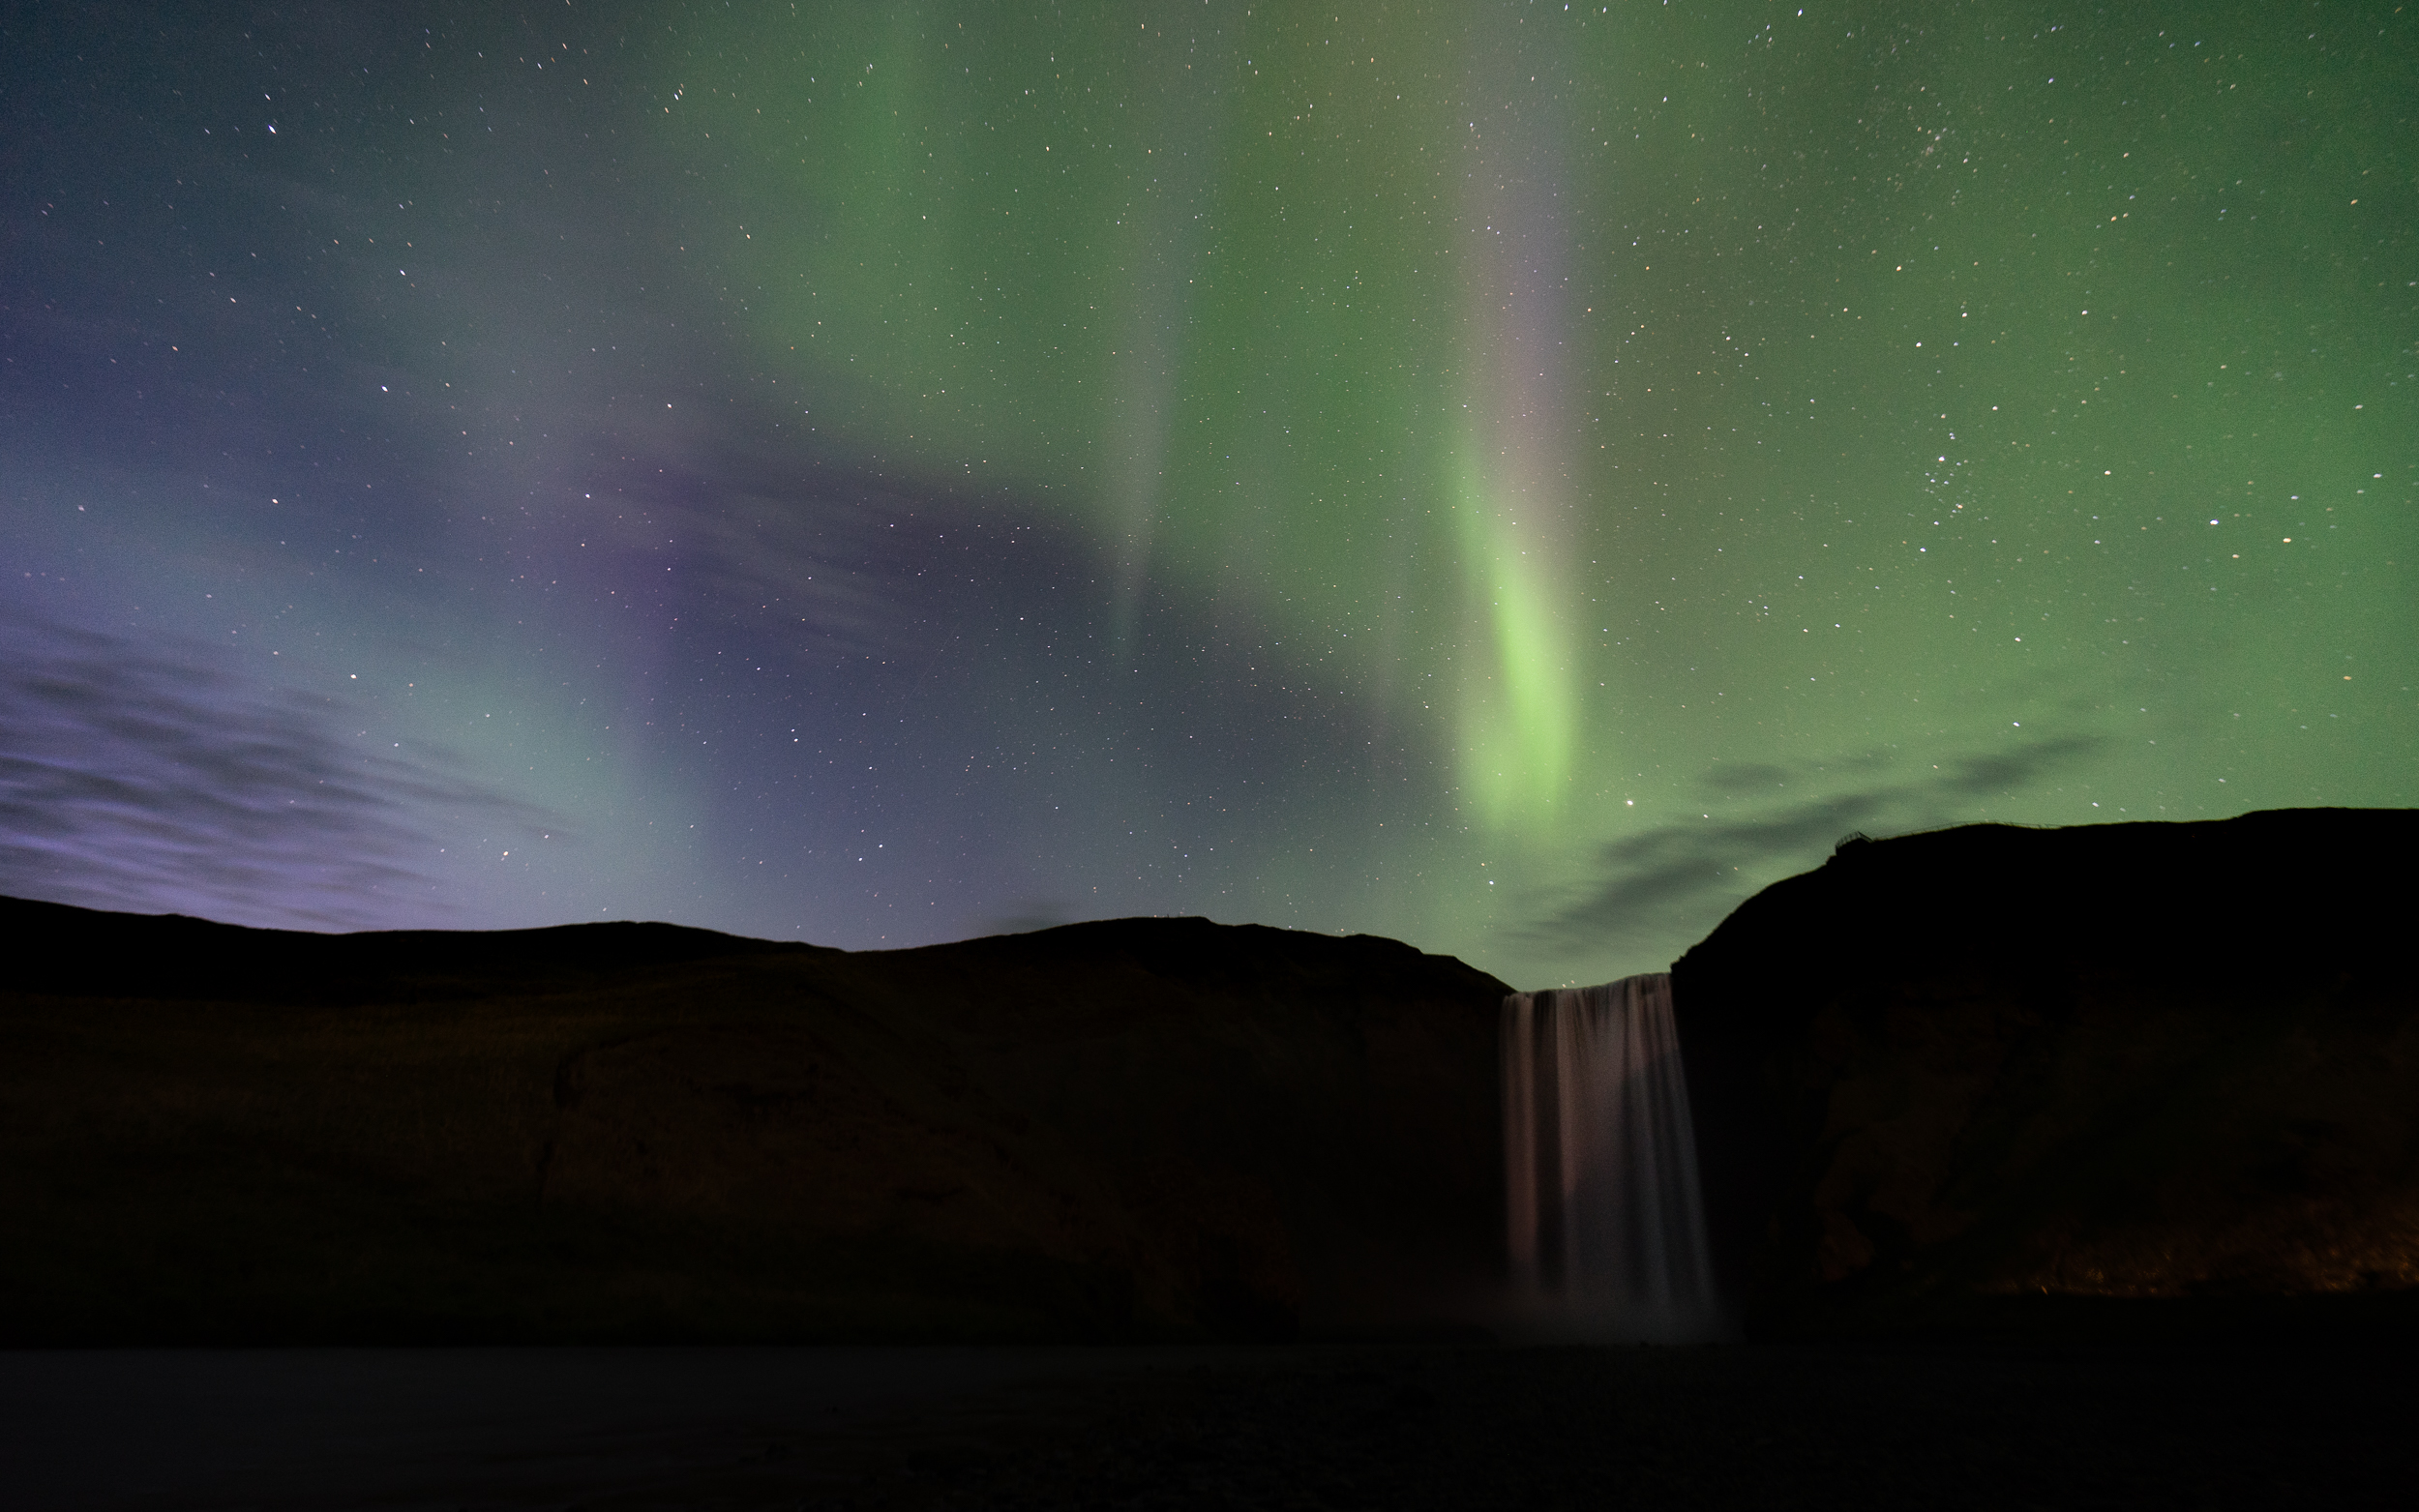 Iceland - 00578 - Chris Goetchius 2017 - WEB UPLOAD ONLY.jpg